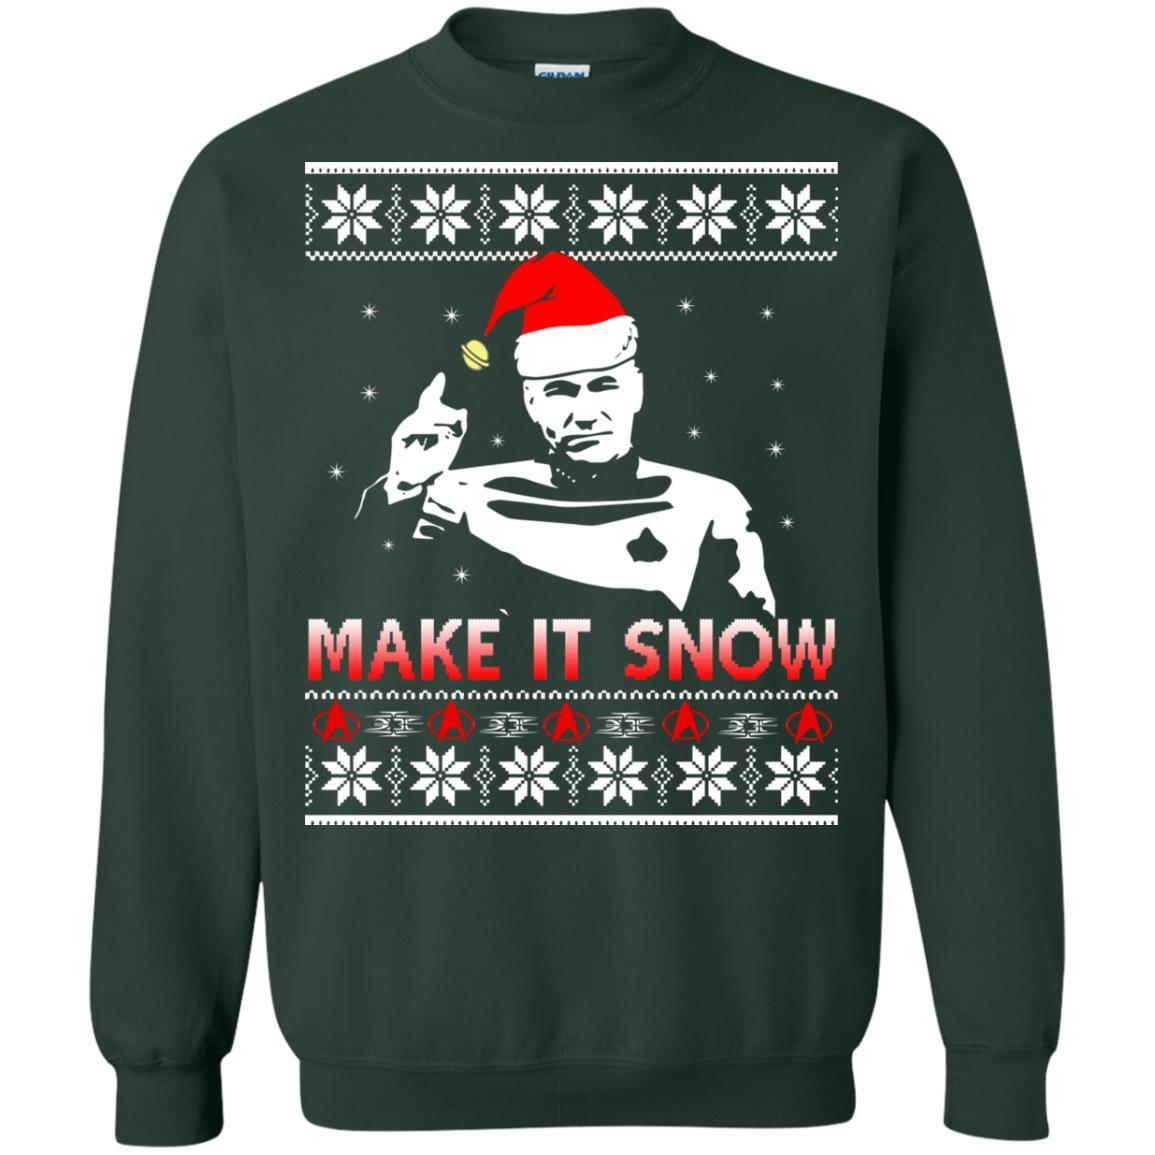 image 2416 - Star Trek make it snow Christmas Sweater, Shirt